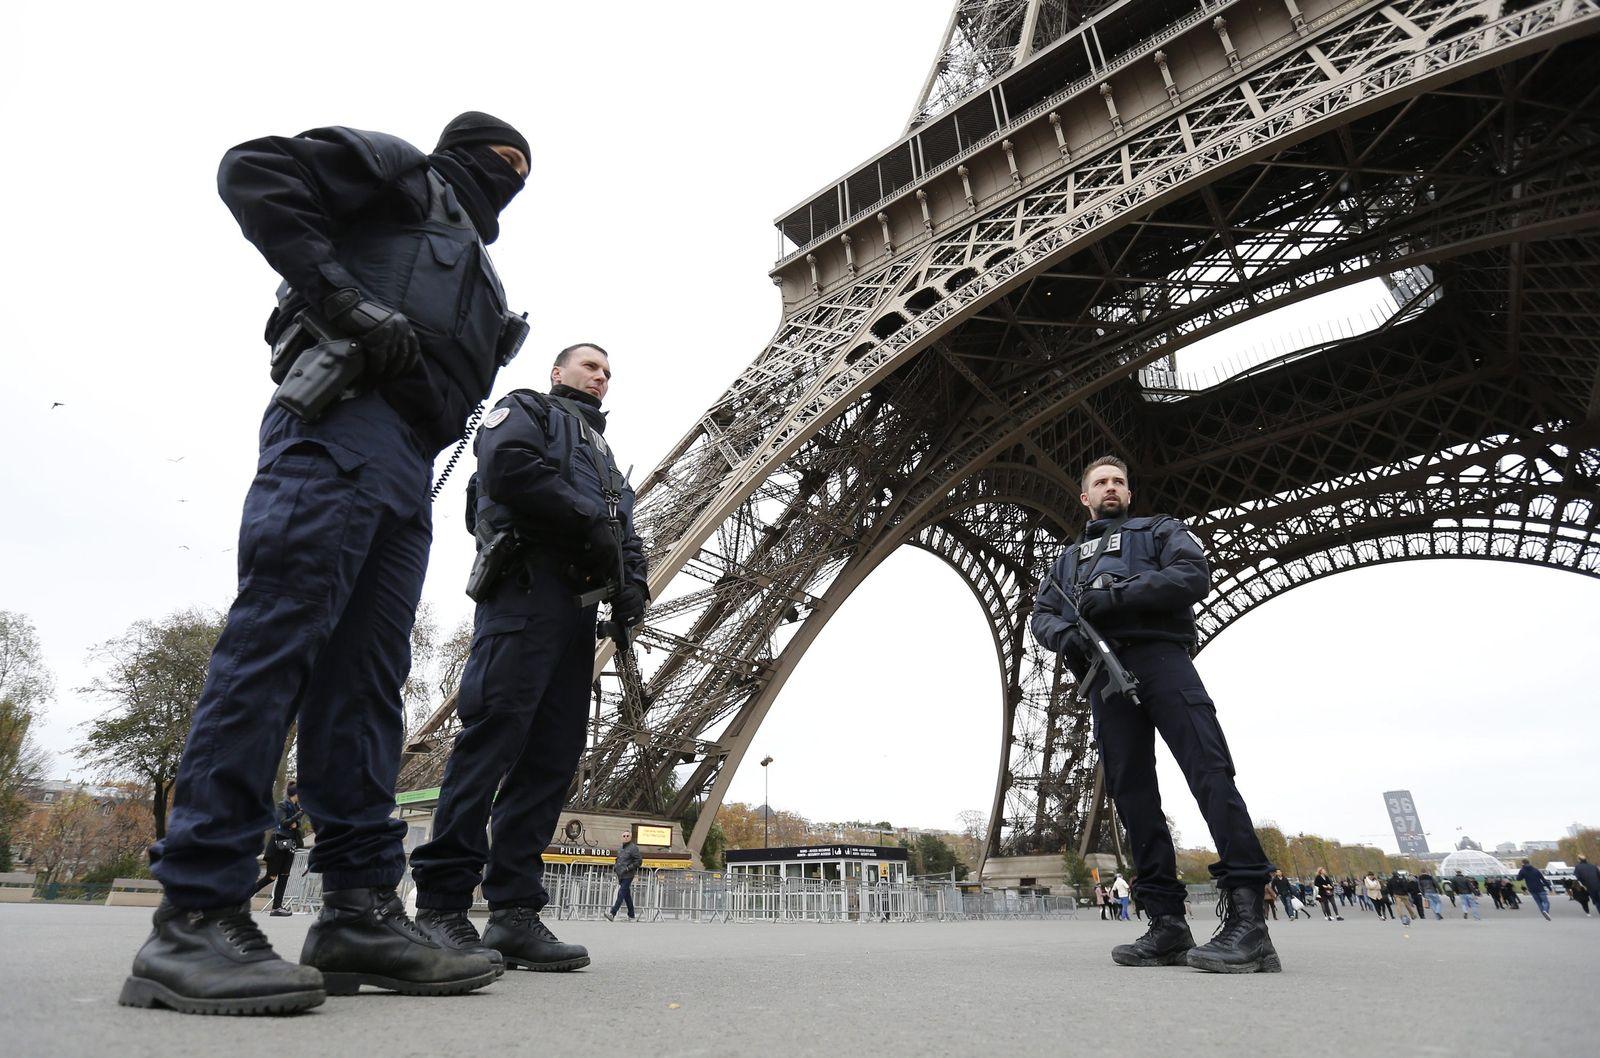 Paris attacks aftermath - security